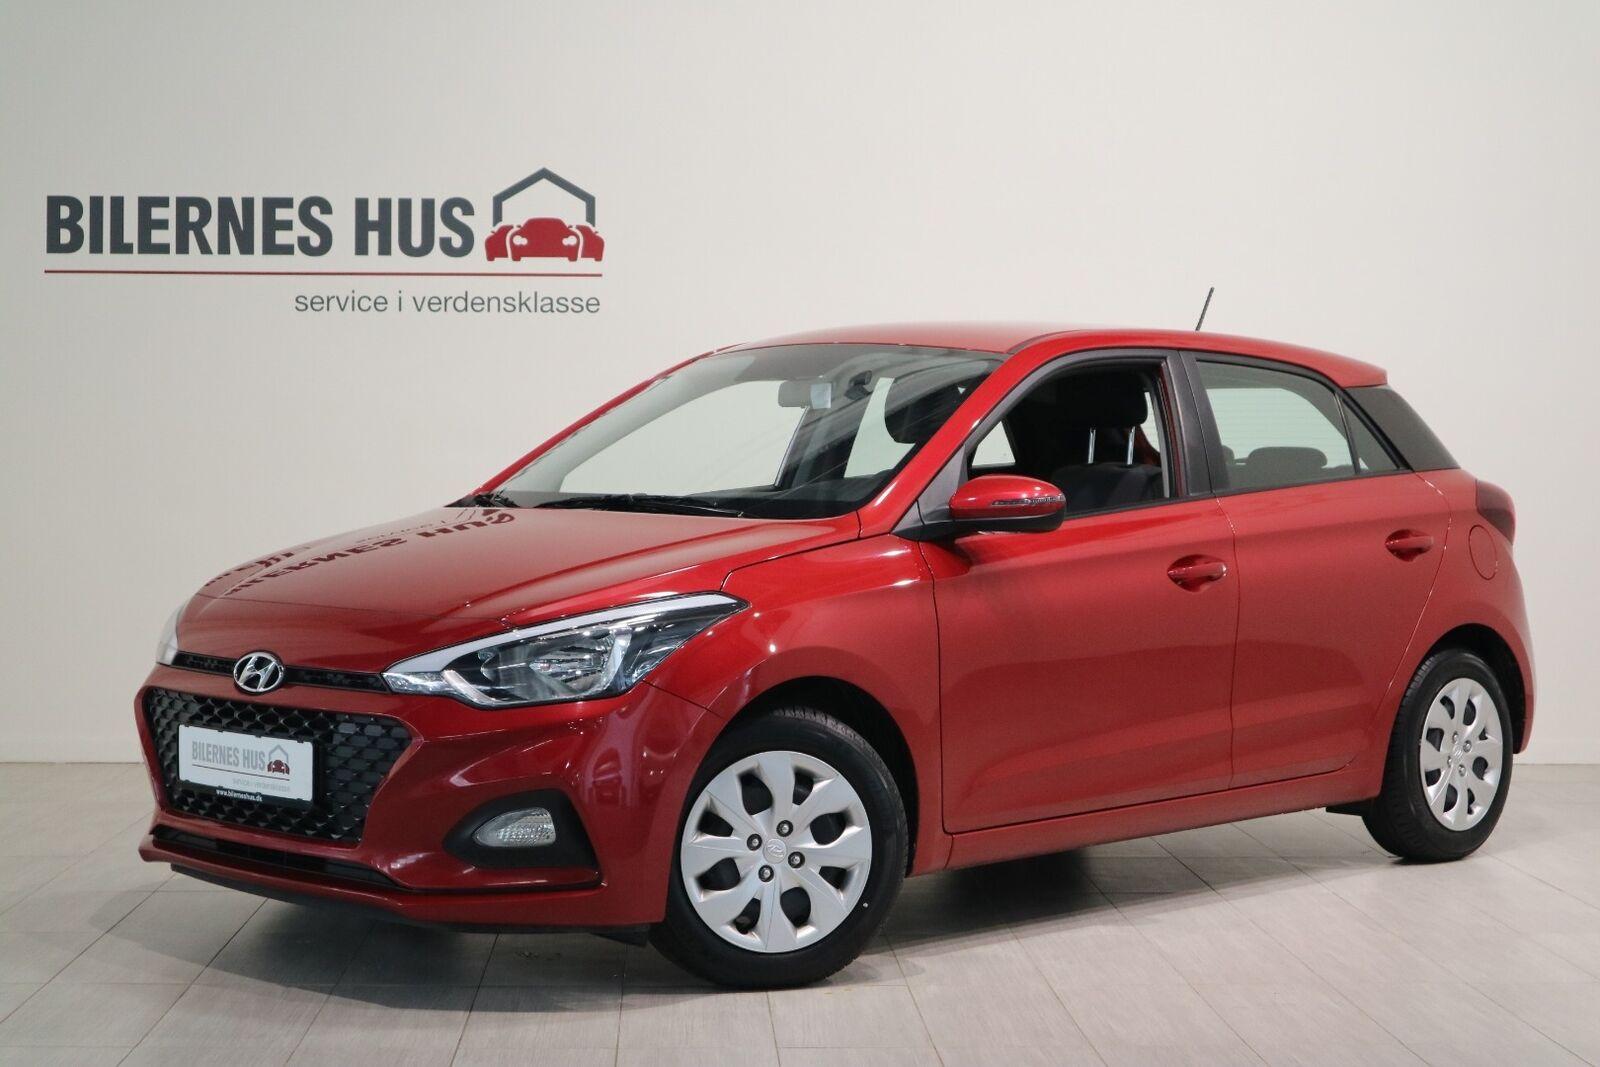 Hyundai i20 Billede 5